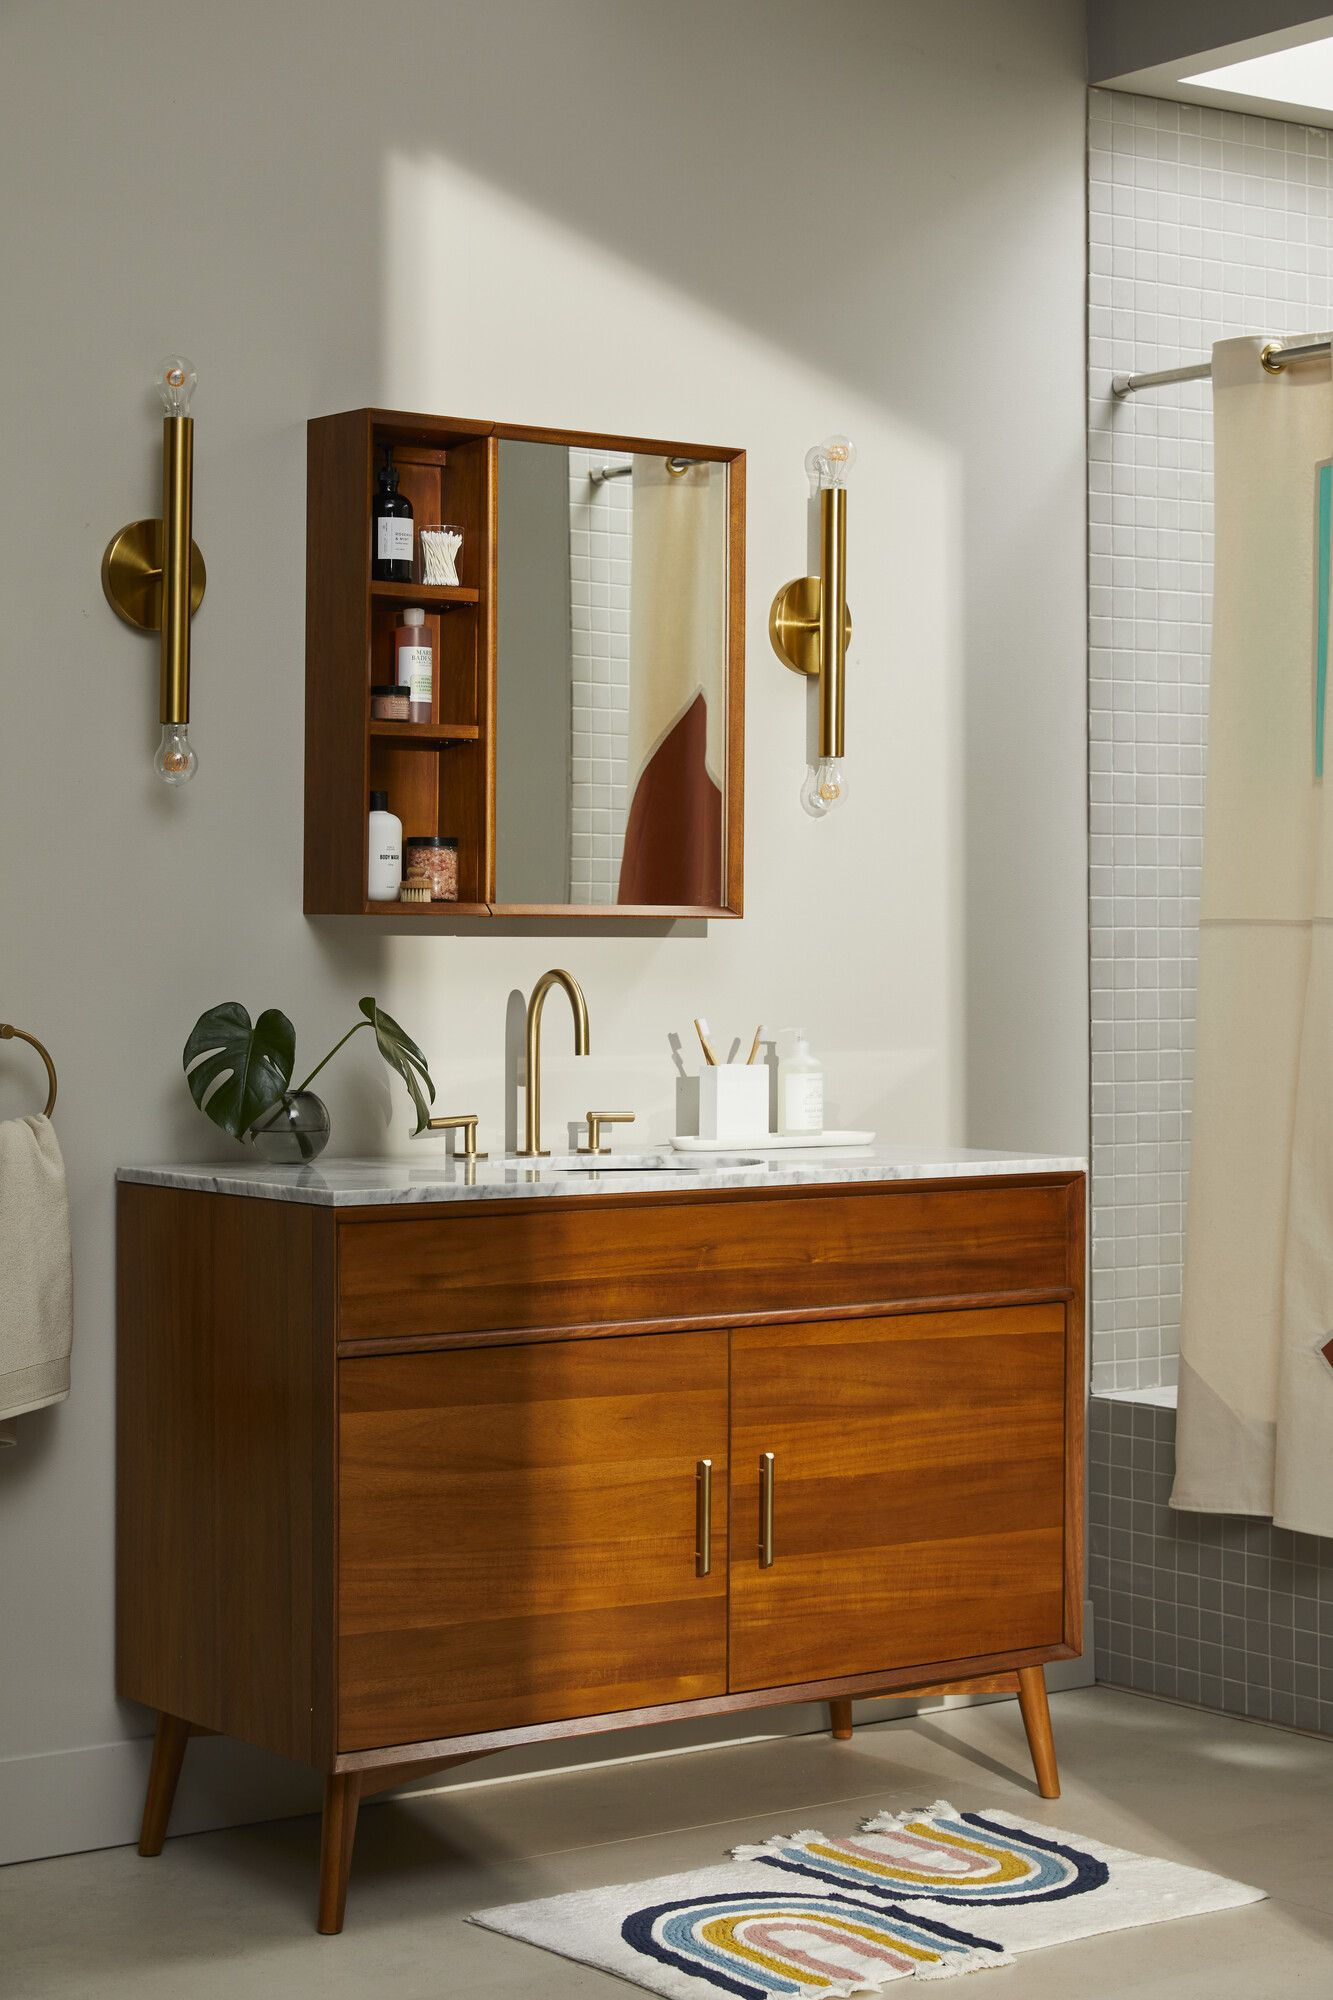 Modern Design That S Safe For Your Kids Modern Bathroom Vanity Mid Century Bathroom Vanity Bathroom Furniture Storage [ 2000 x 1333 Pixel ]